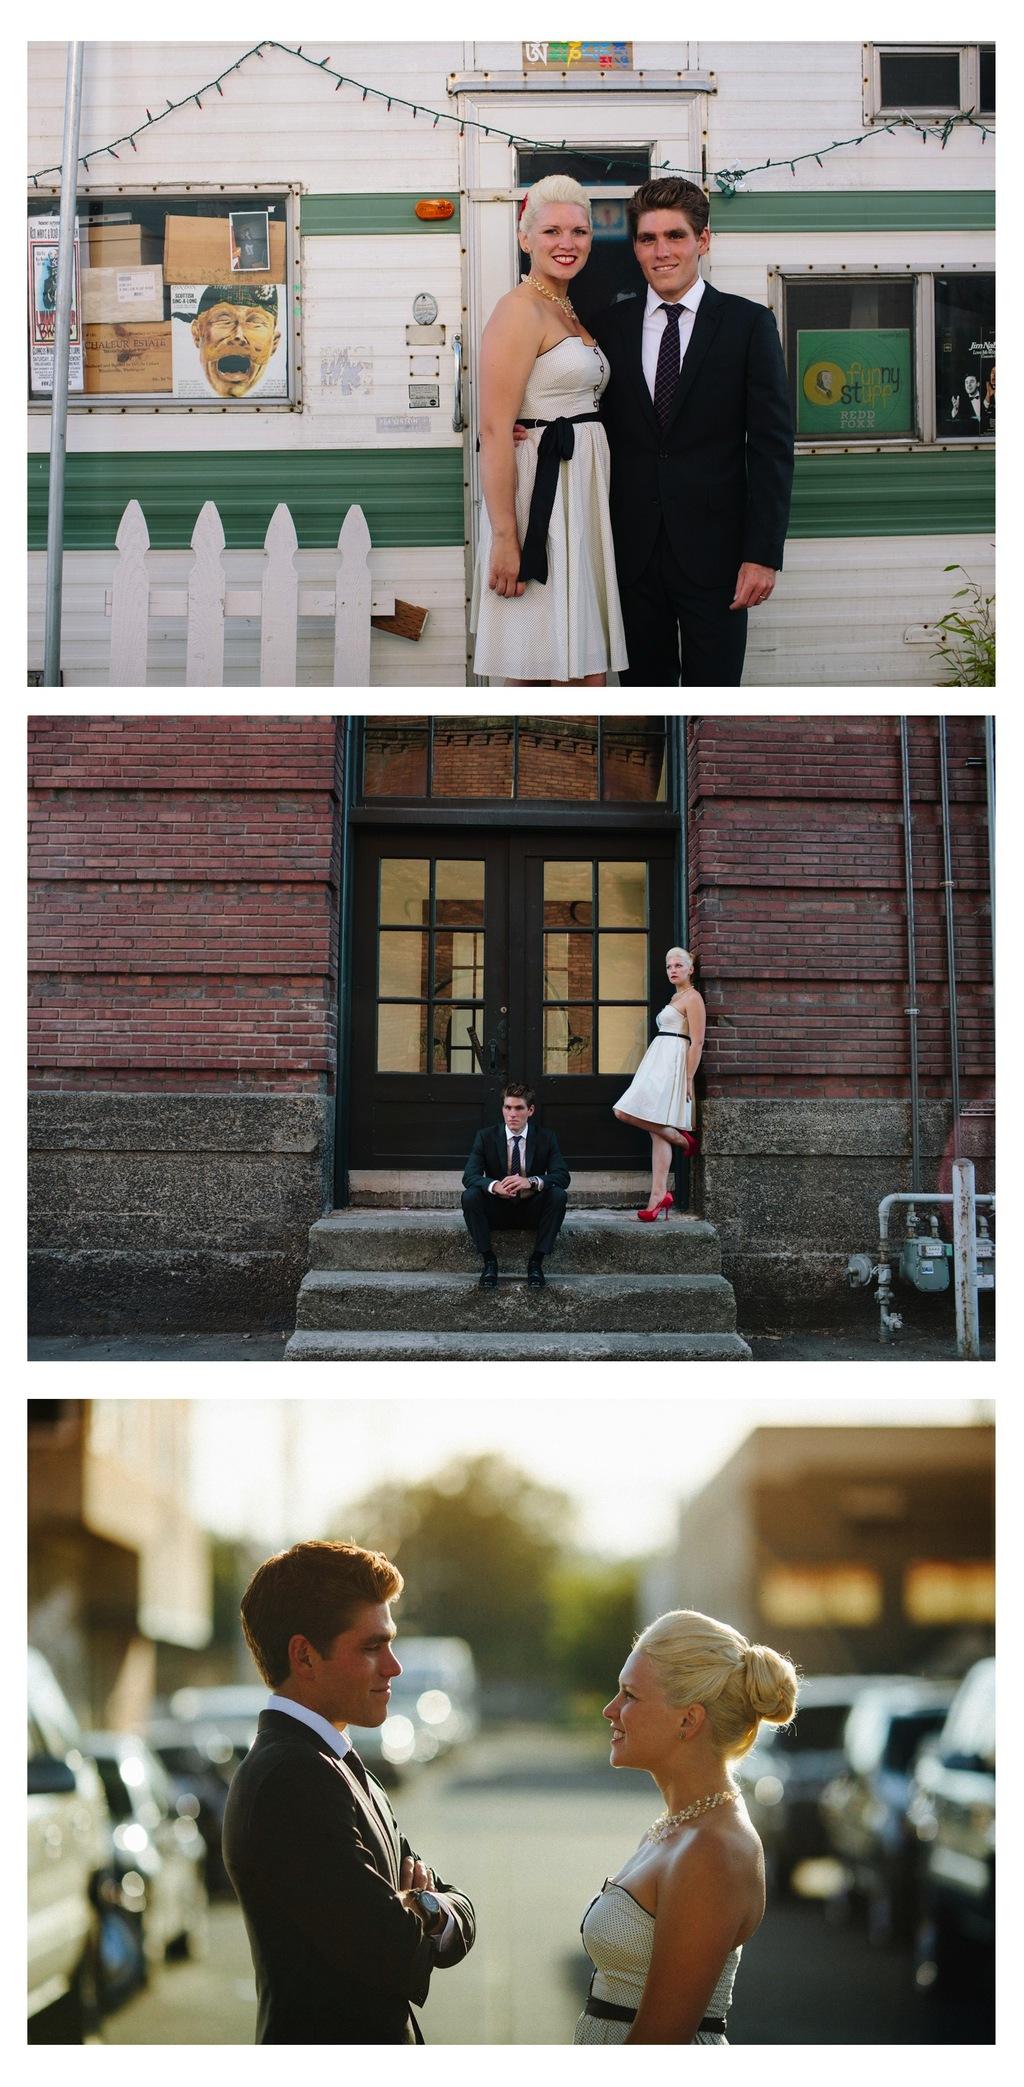 Coffey-wood-beach-real-wedding-linhbergh-photography-bride-groom-details-couple-reception-venue.full